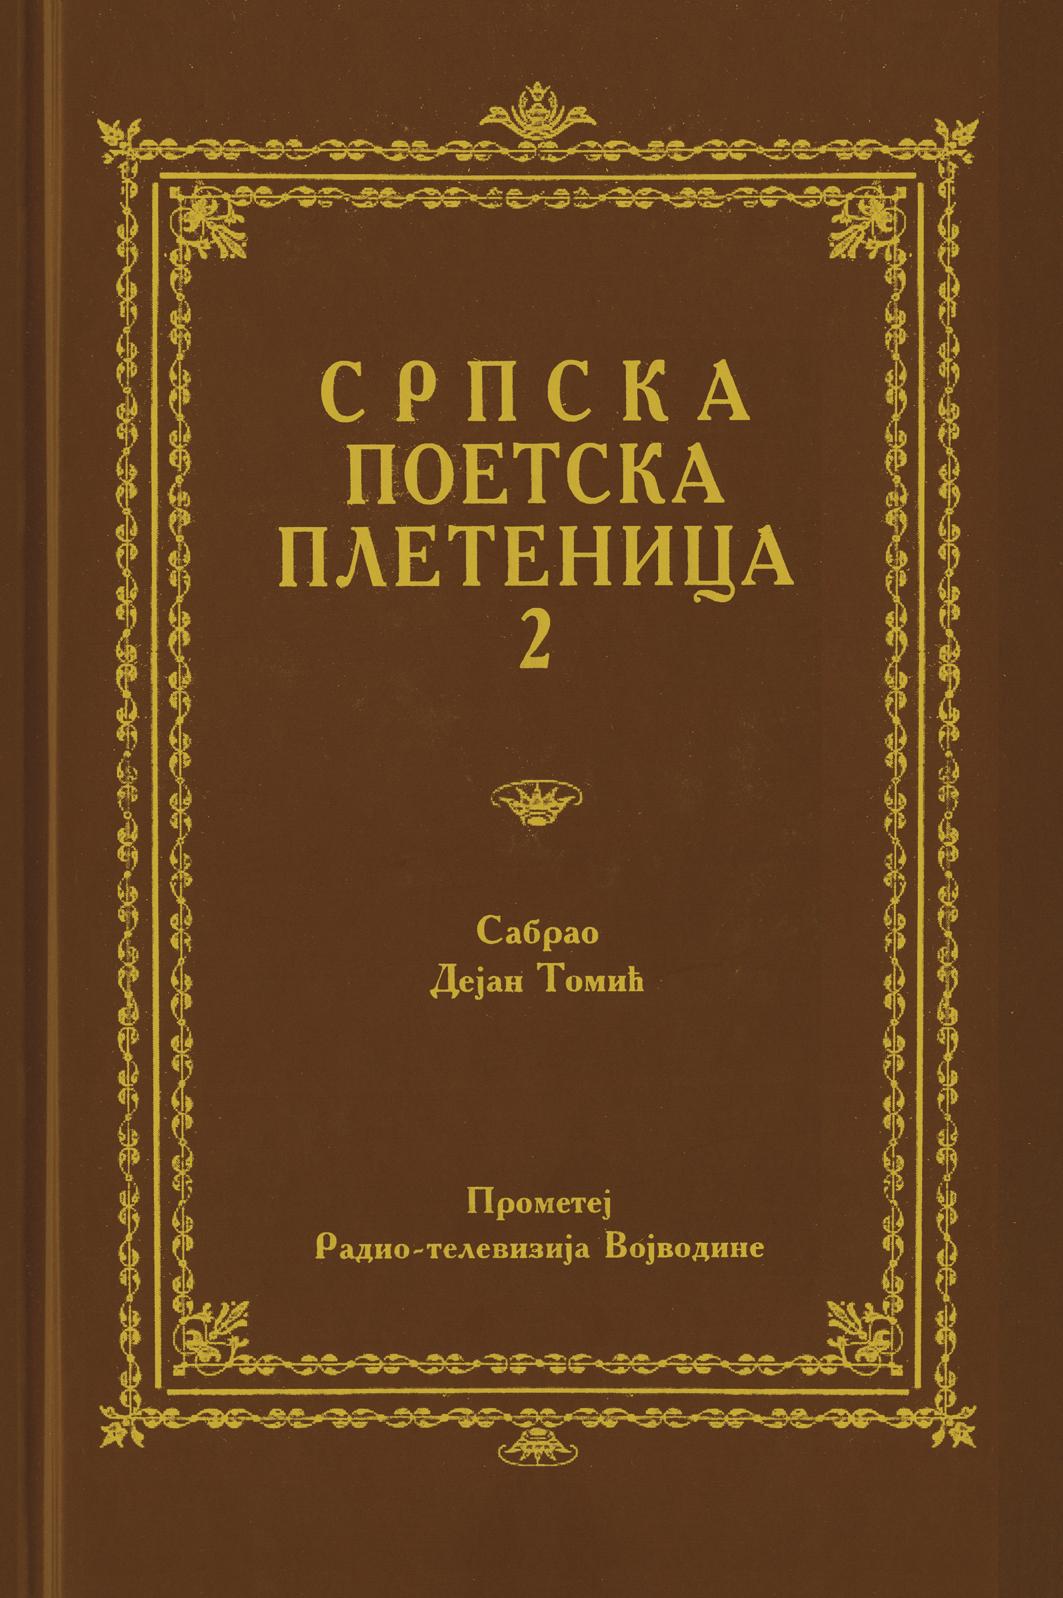 Српска поетска плетеница 2